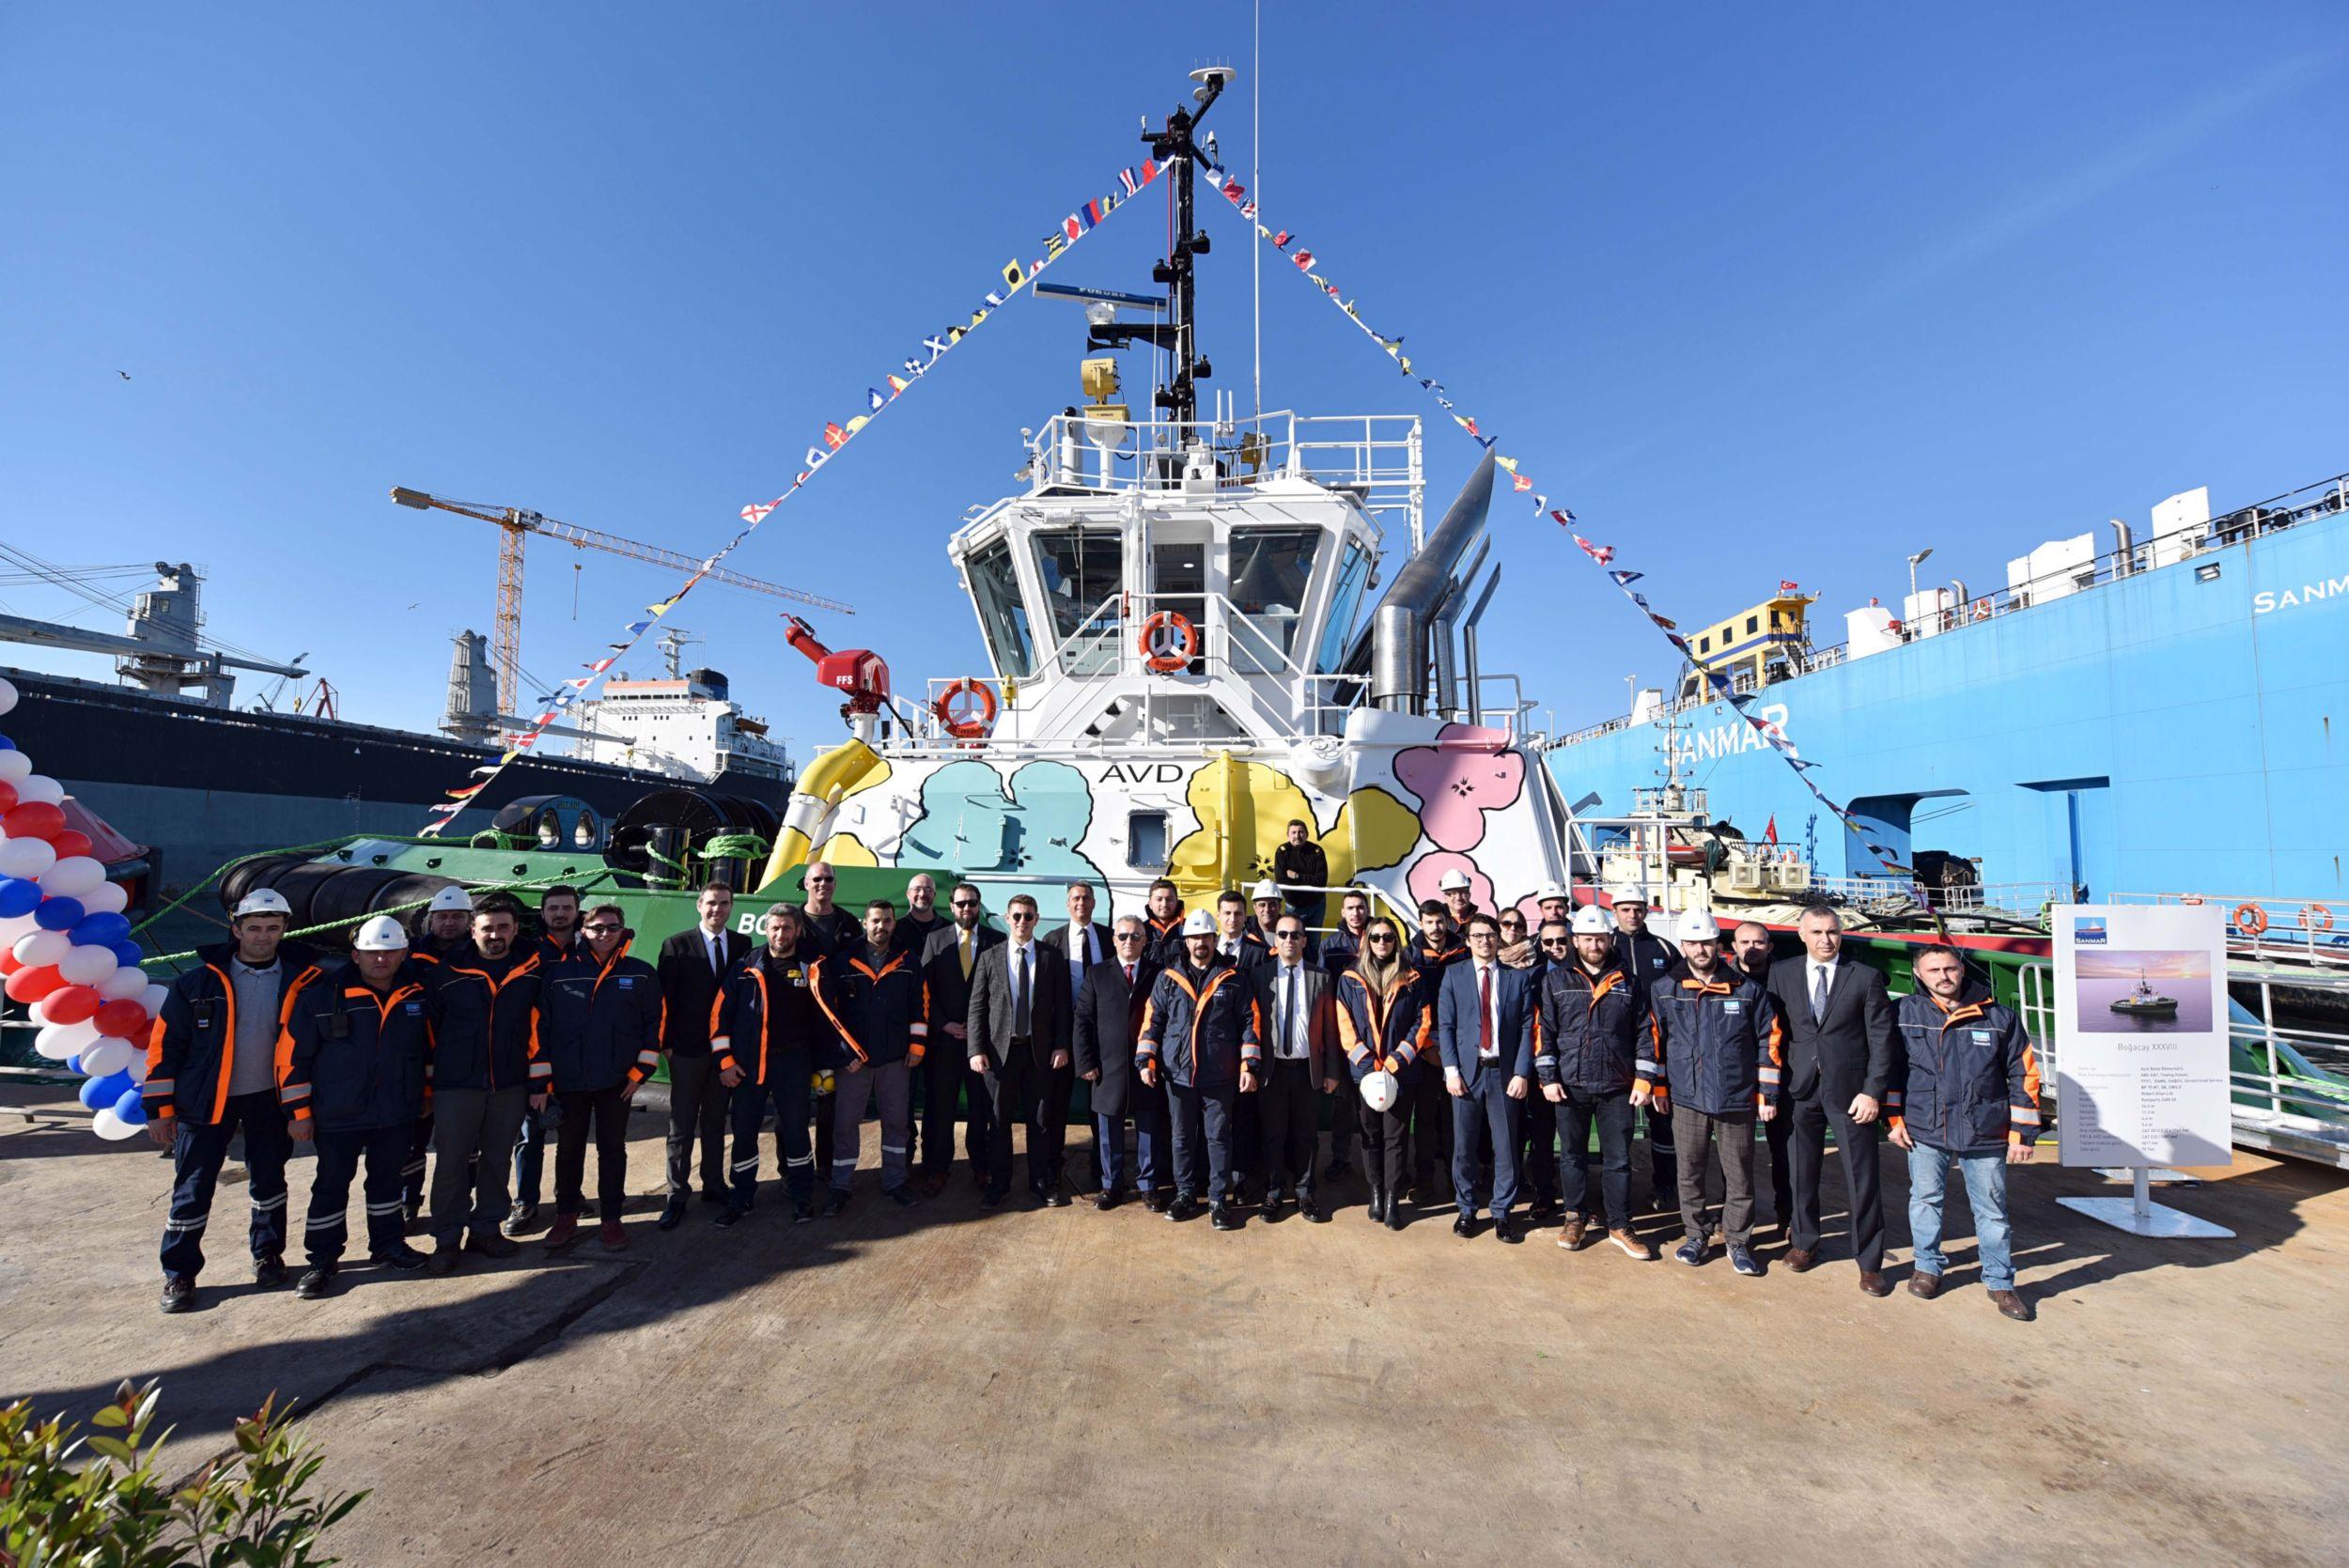 Ceremonial launch of Sanmar's Boğaçay38 tug